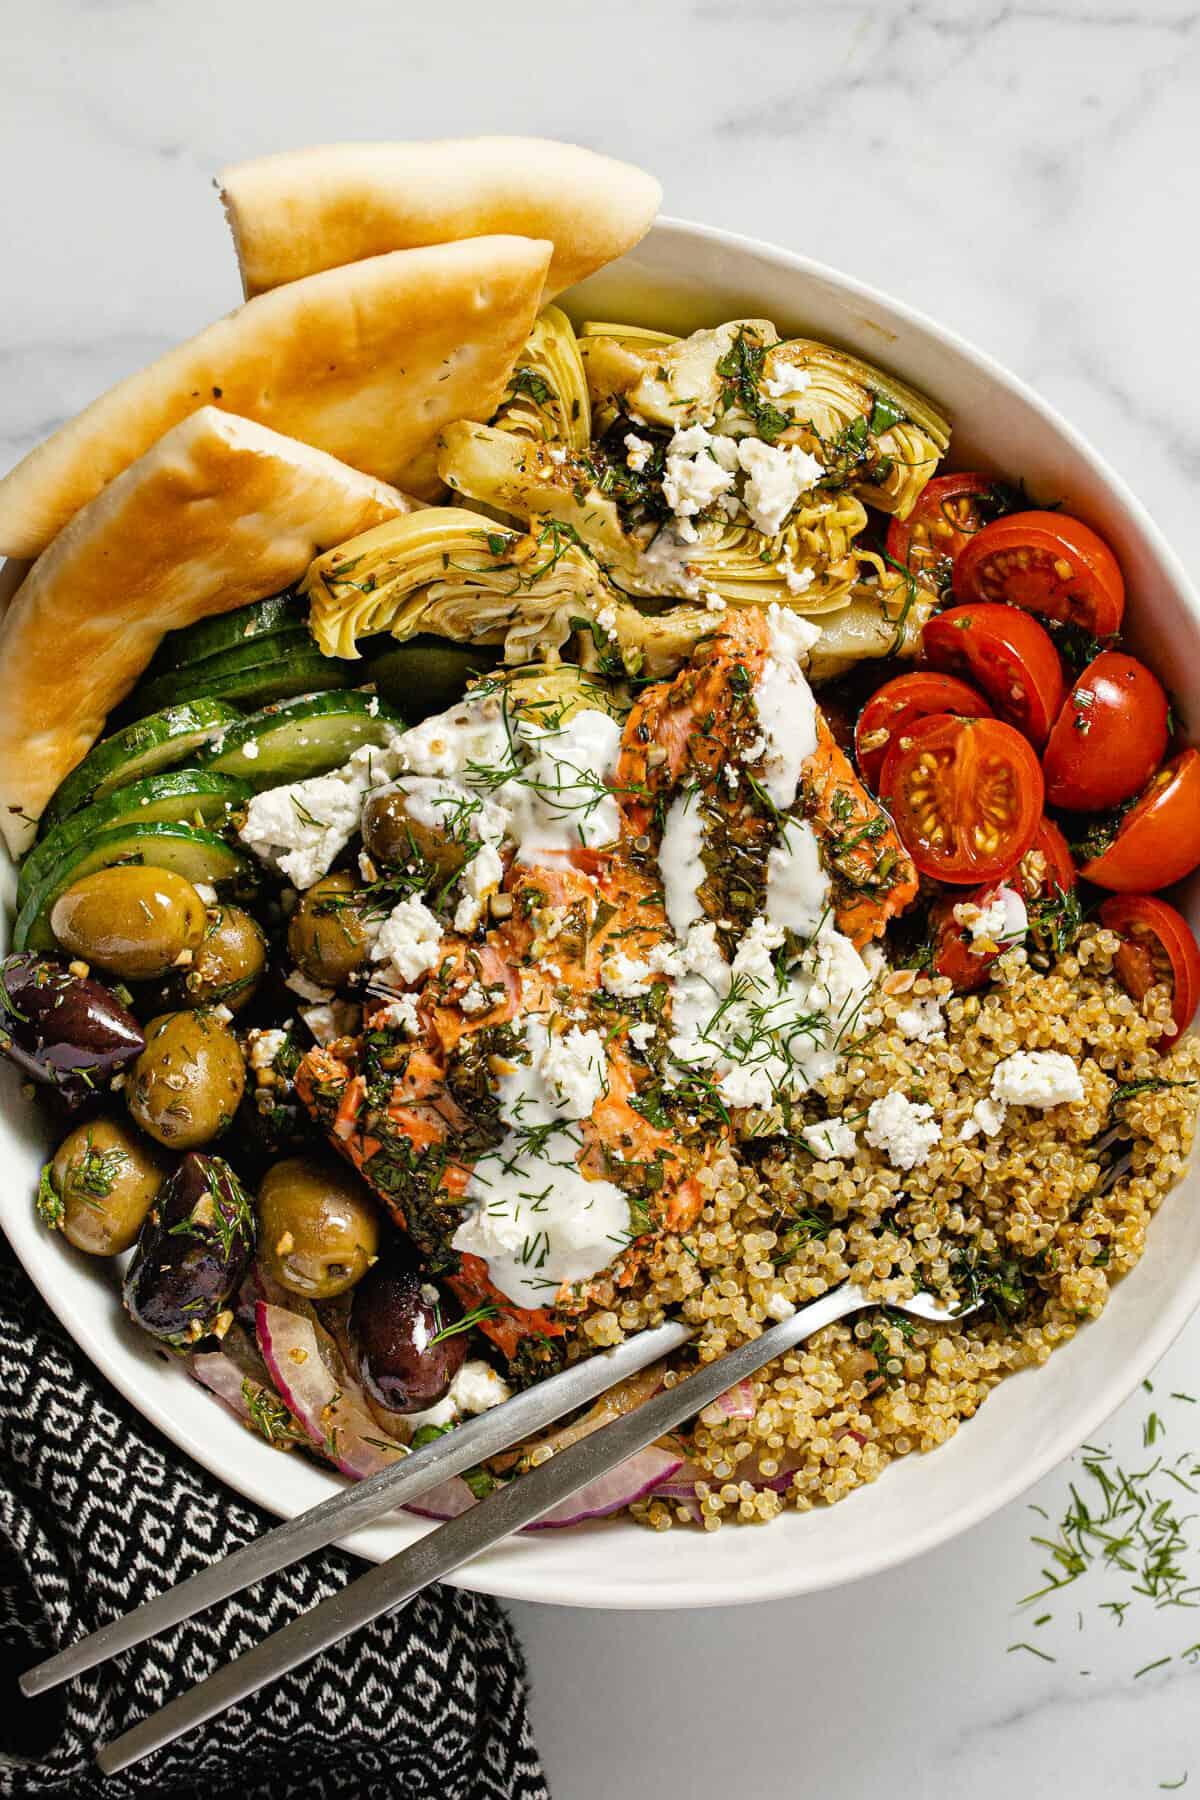 Large white bowl filled with Mediterranean salmon veggies and quinoa